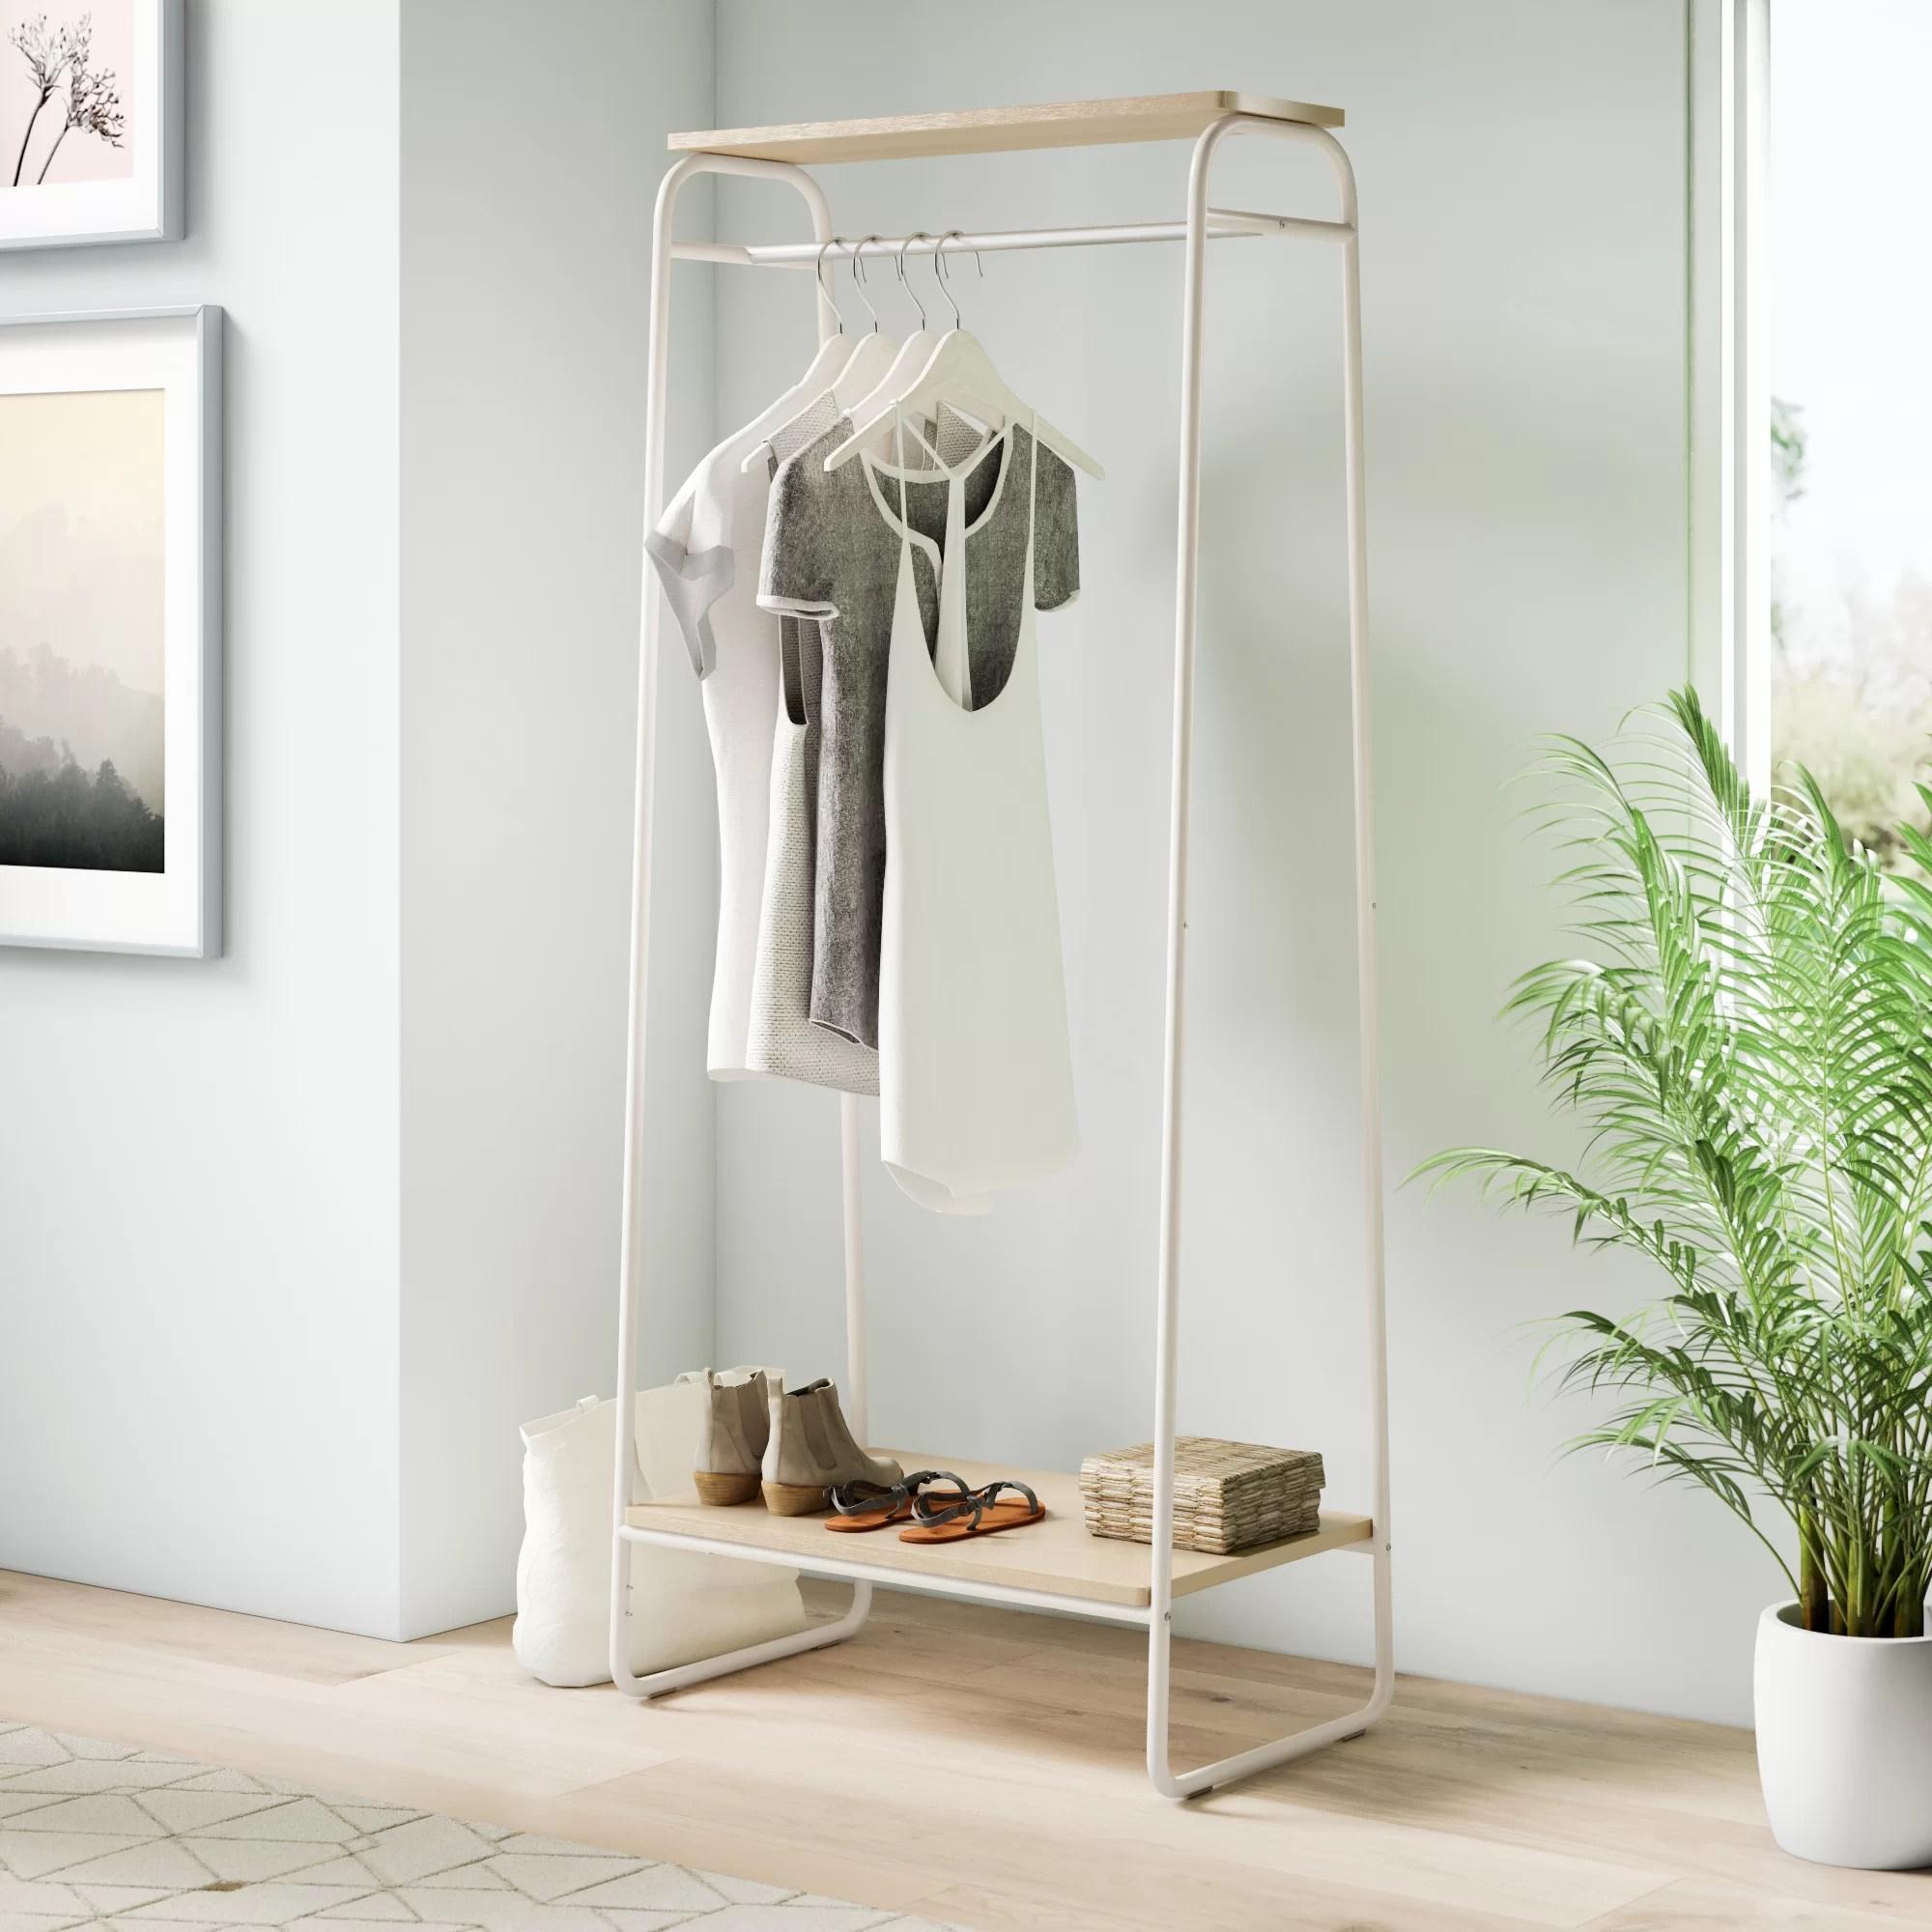 diggs 25 2 clothes rack